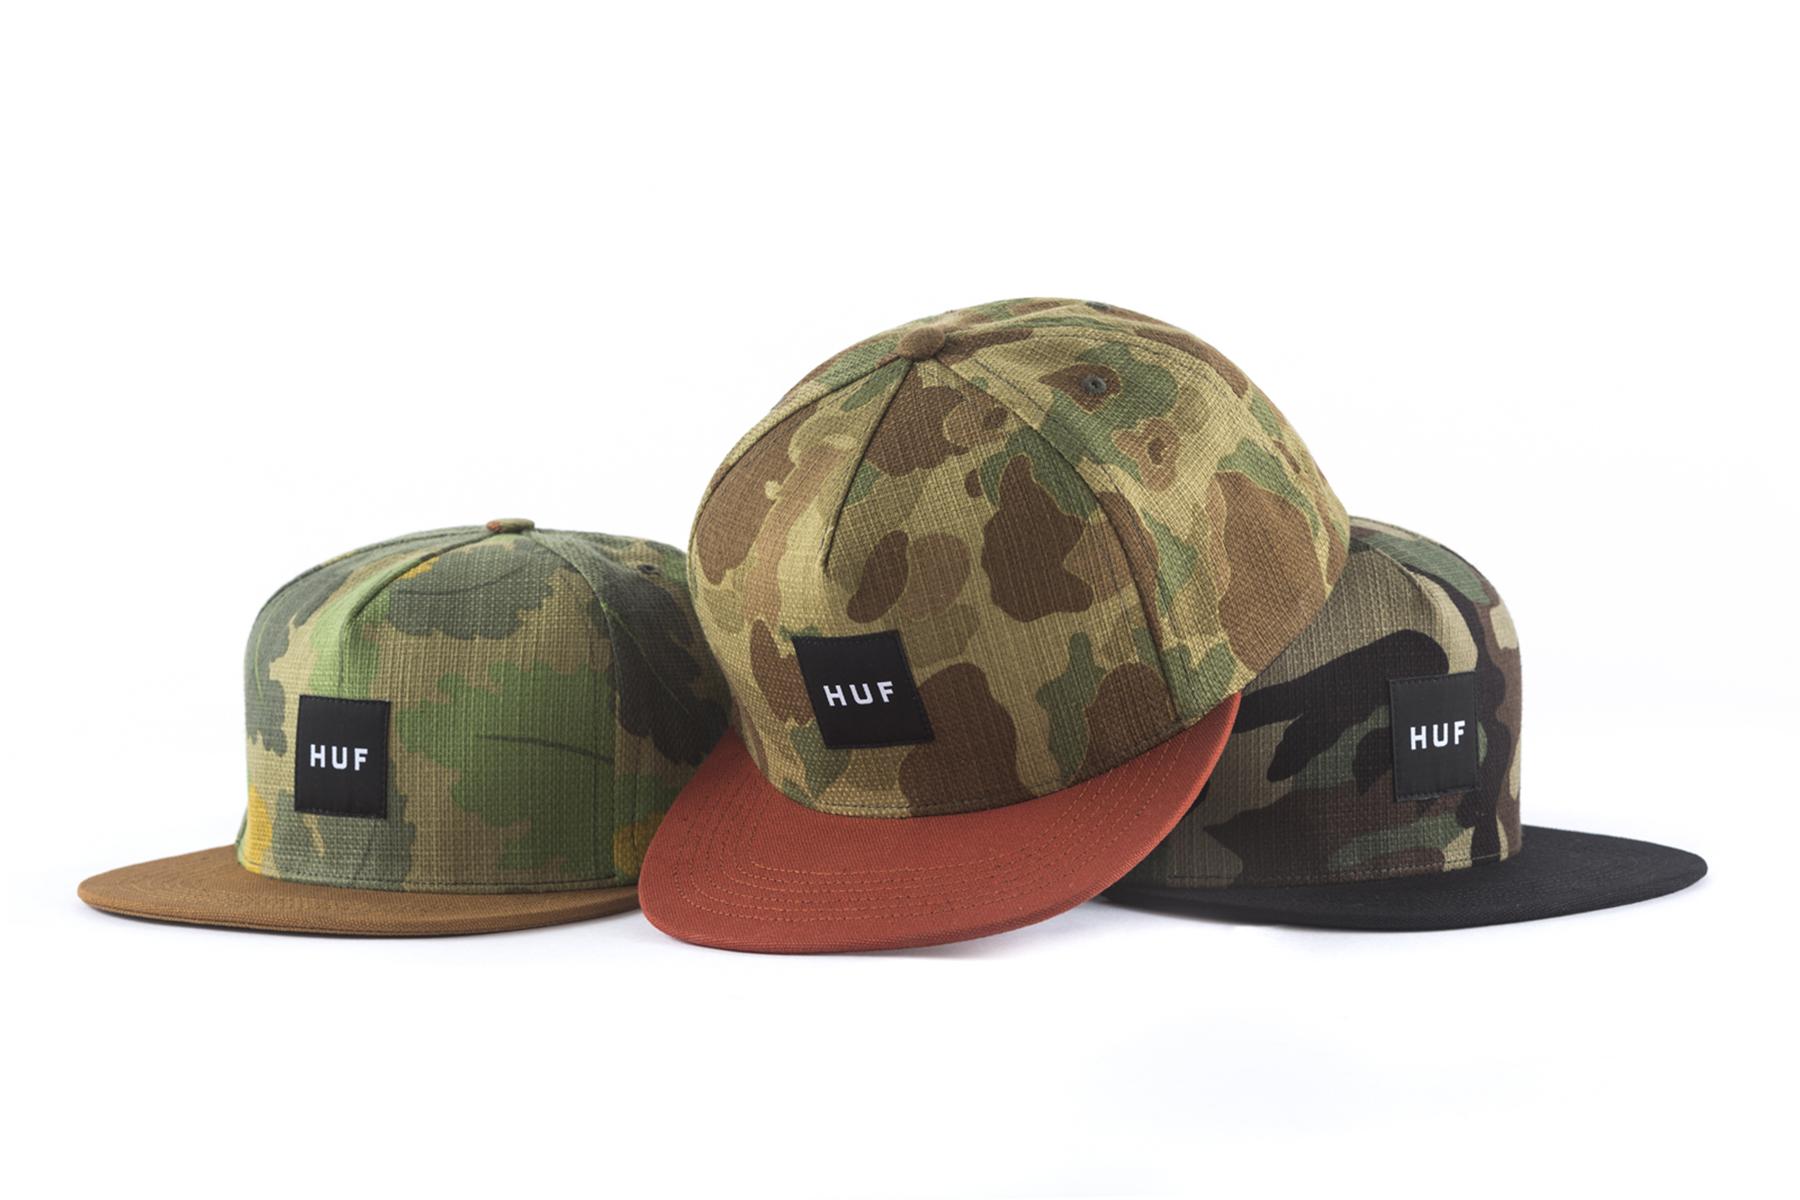 HUF 2014 Spring/Summer Headwear Collection